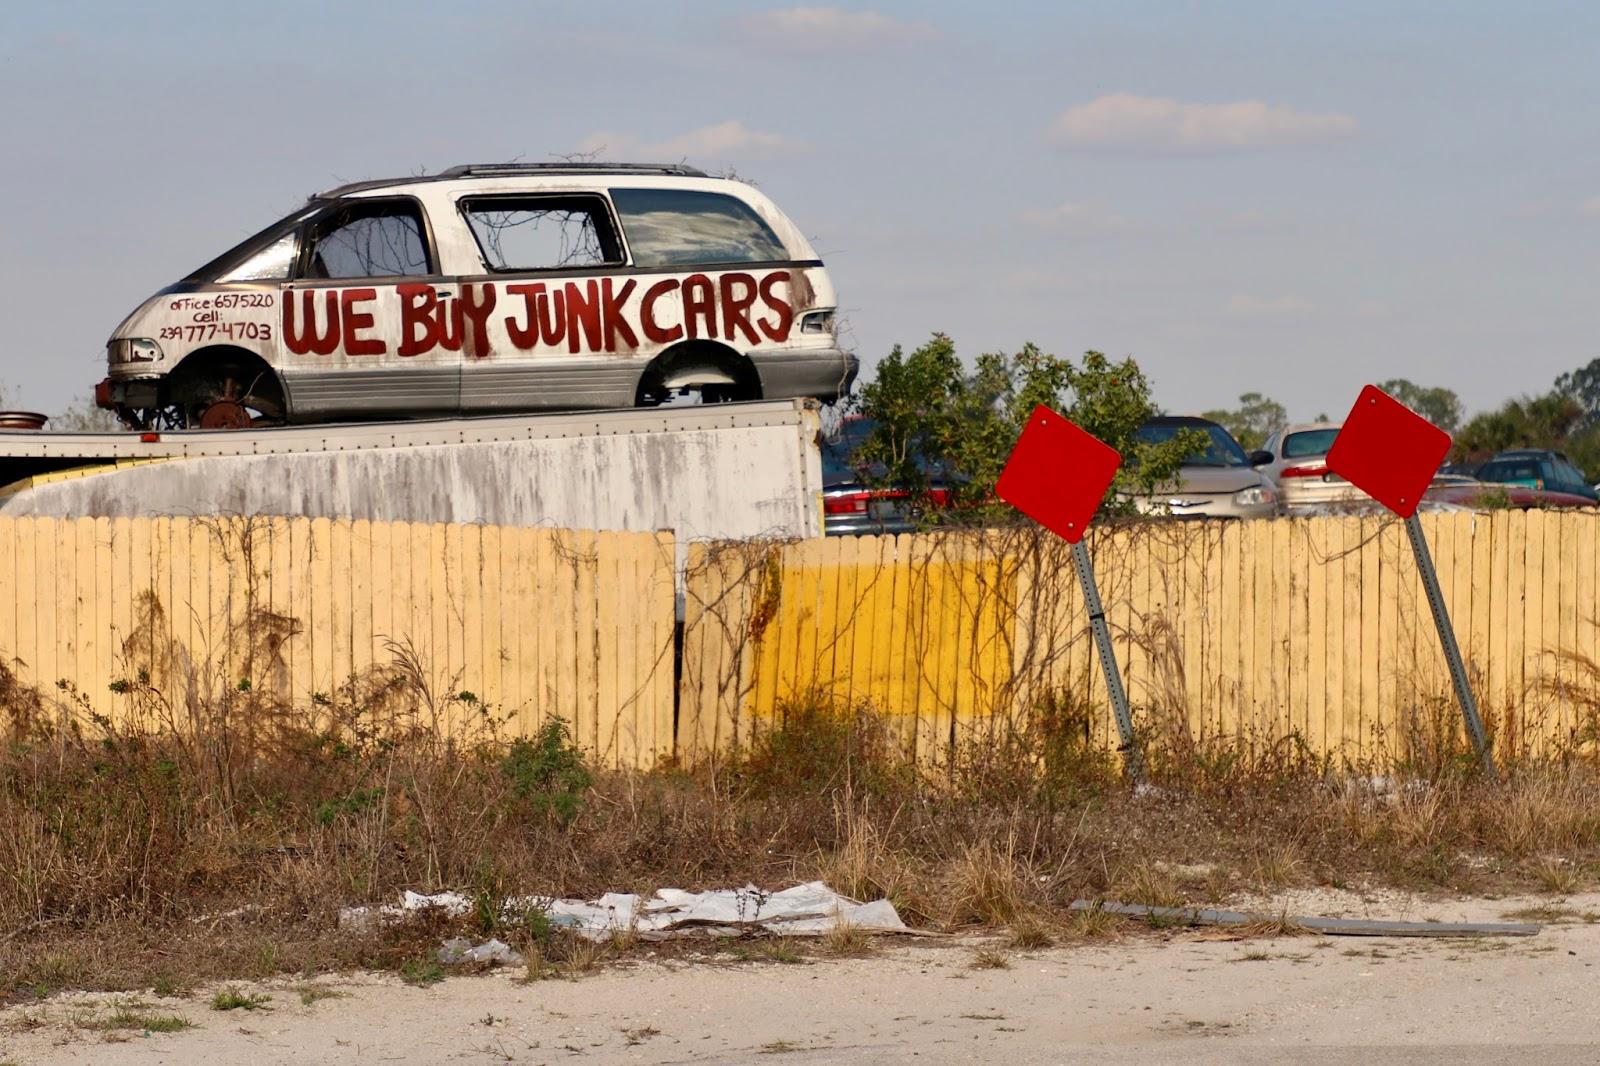 Naples and Hartford in Season: We Buy Junk Cars